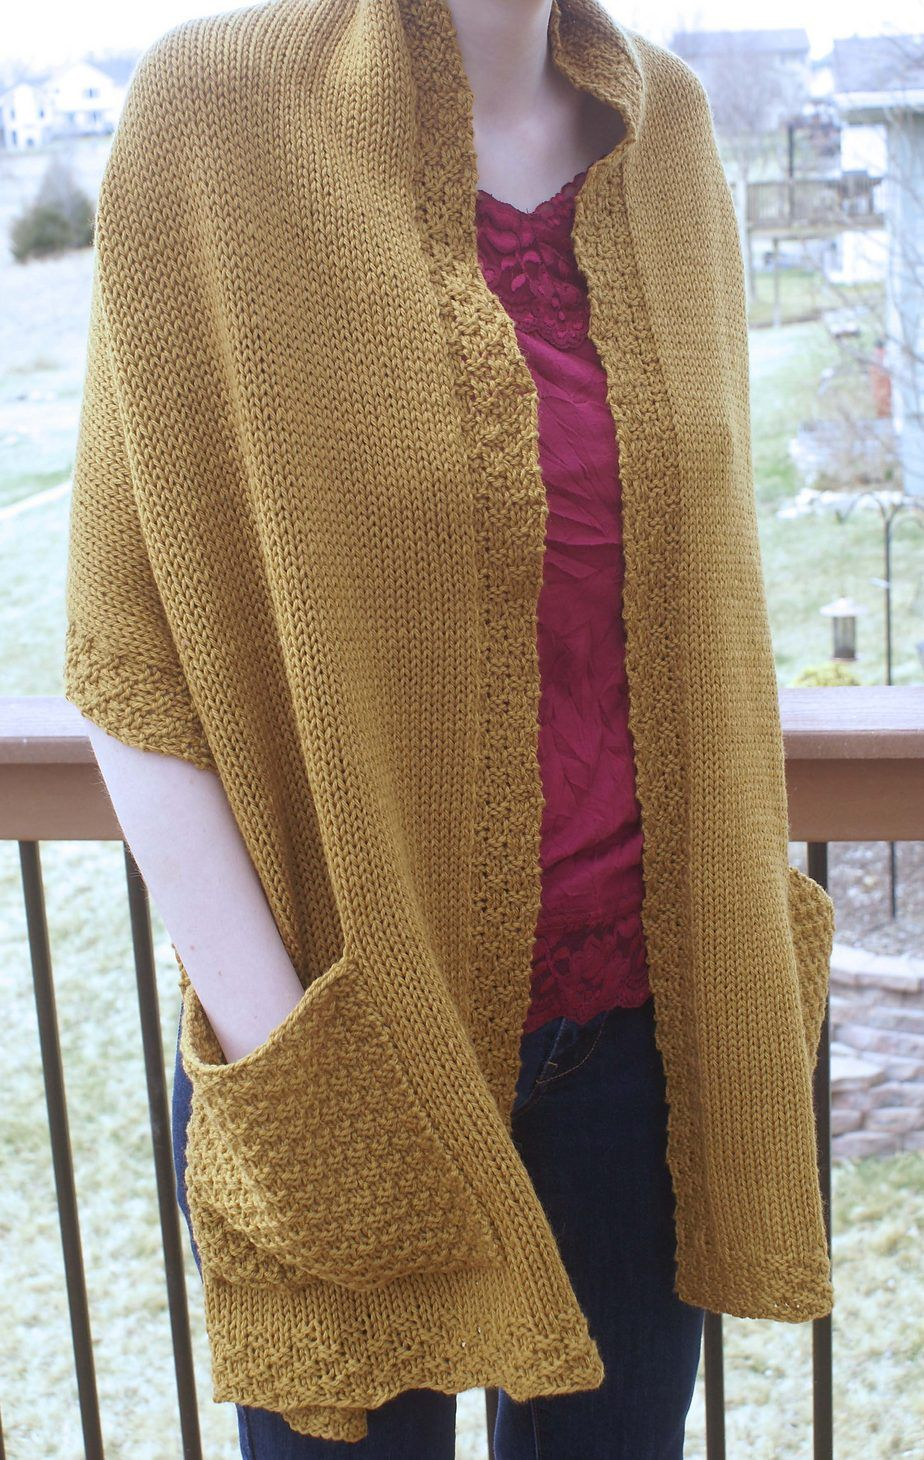 Pocket Wrap Knitting Patterns | Knitting patterns, Wraps and Patterns